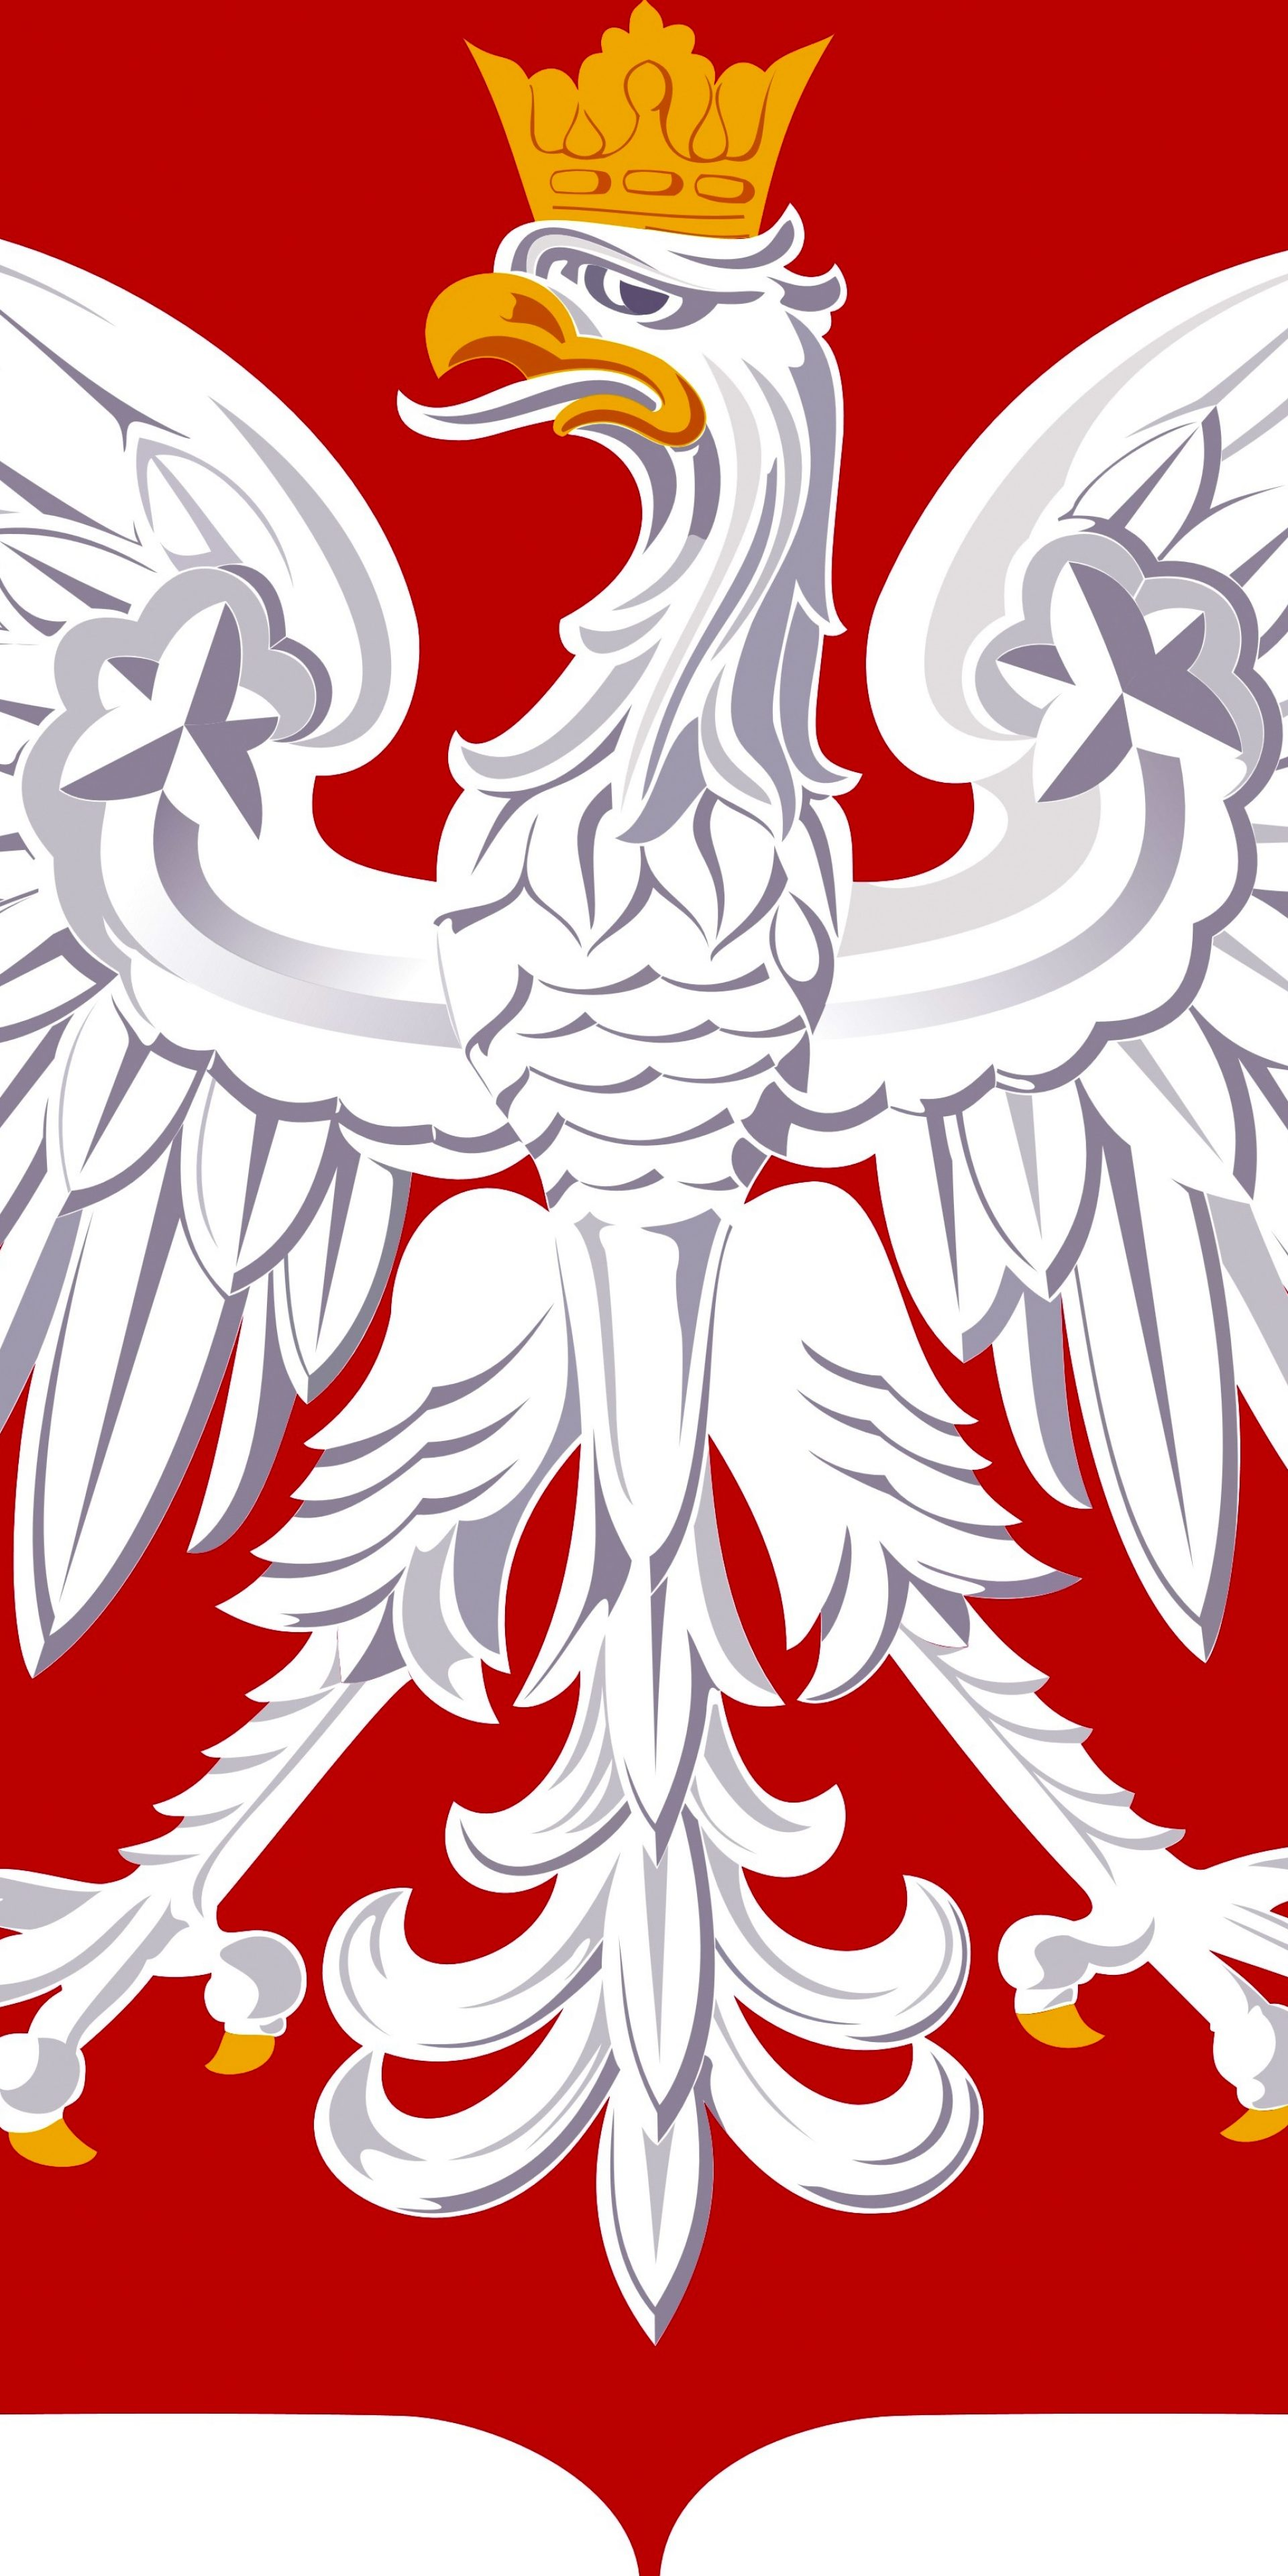 herb_polski001